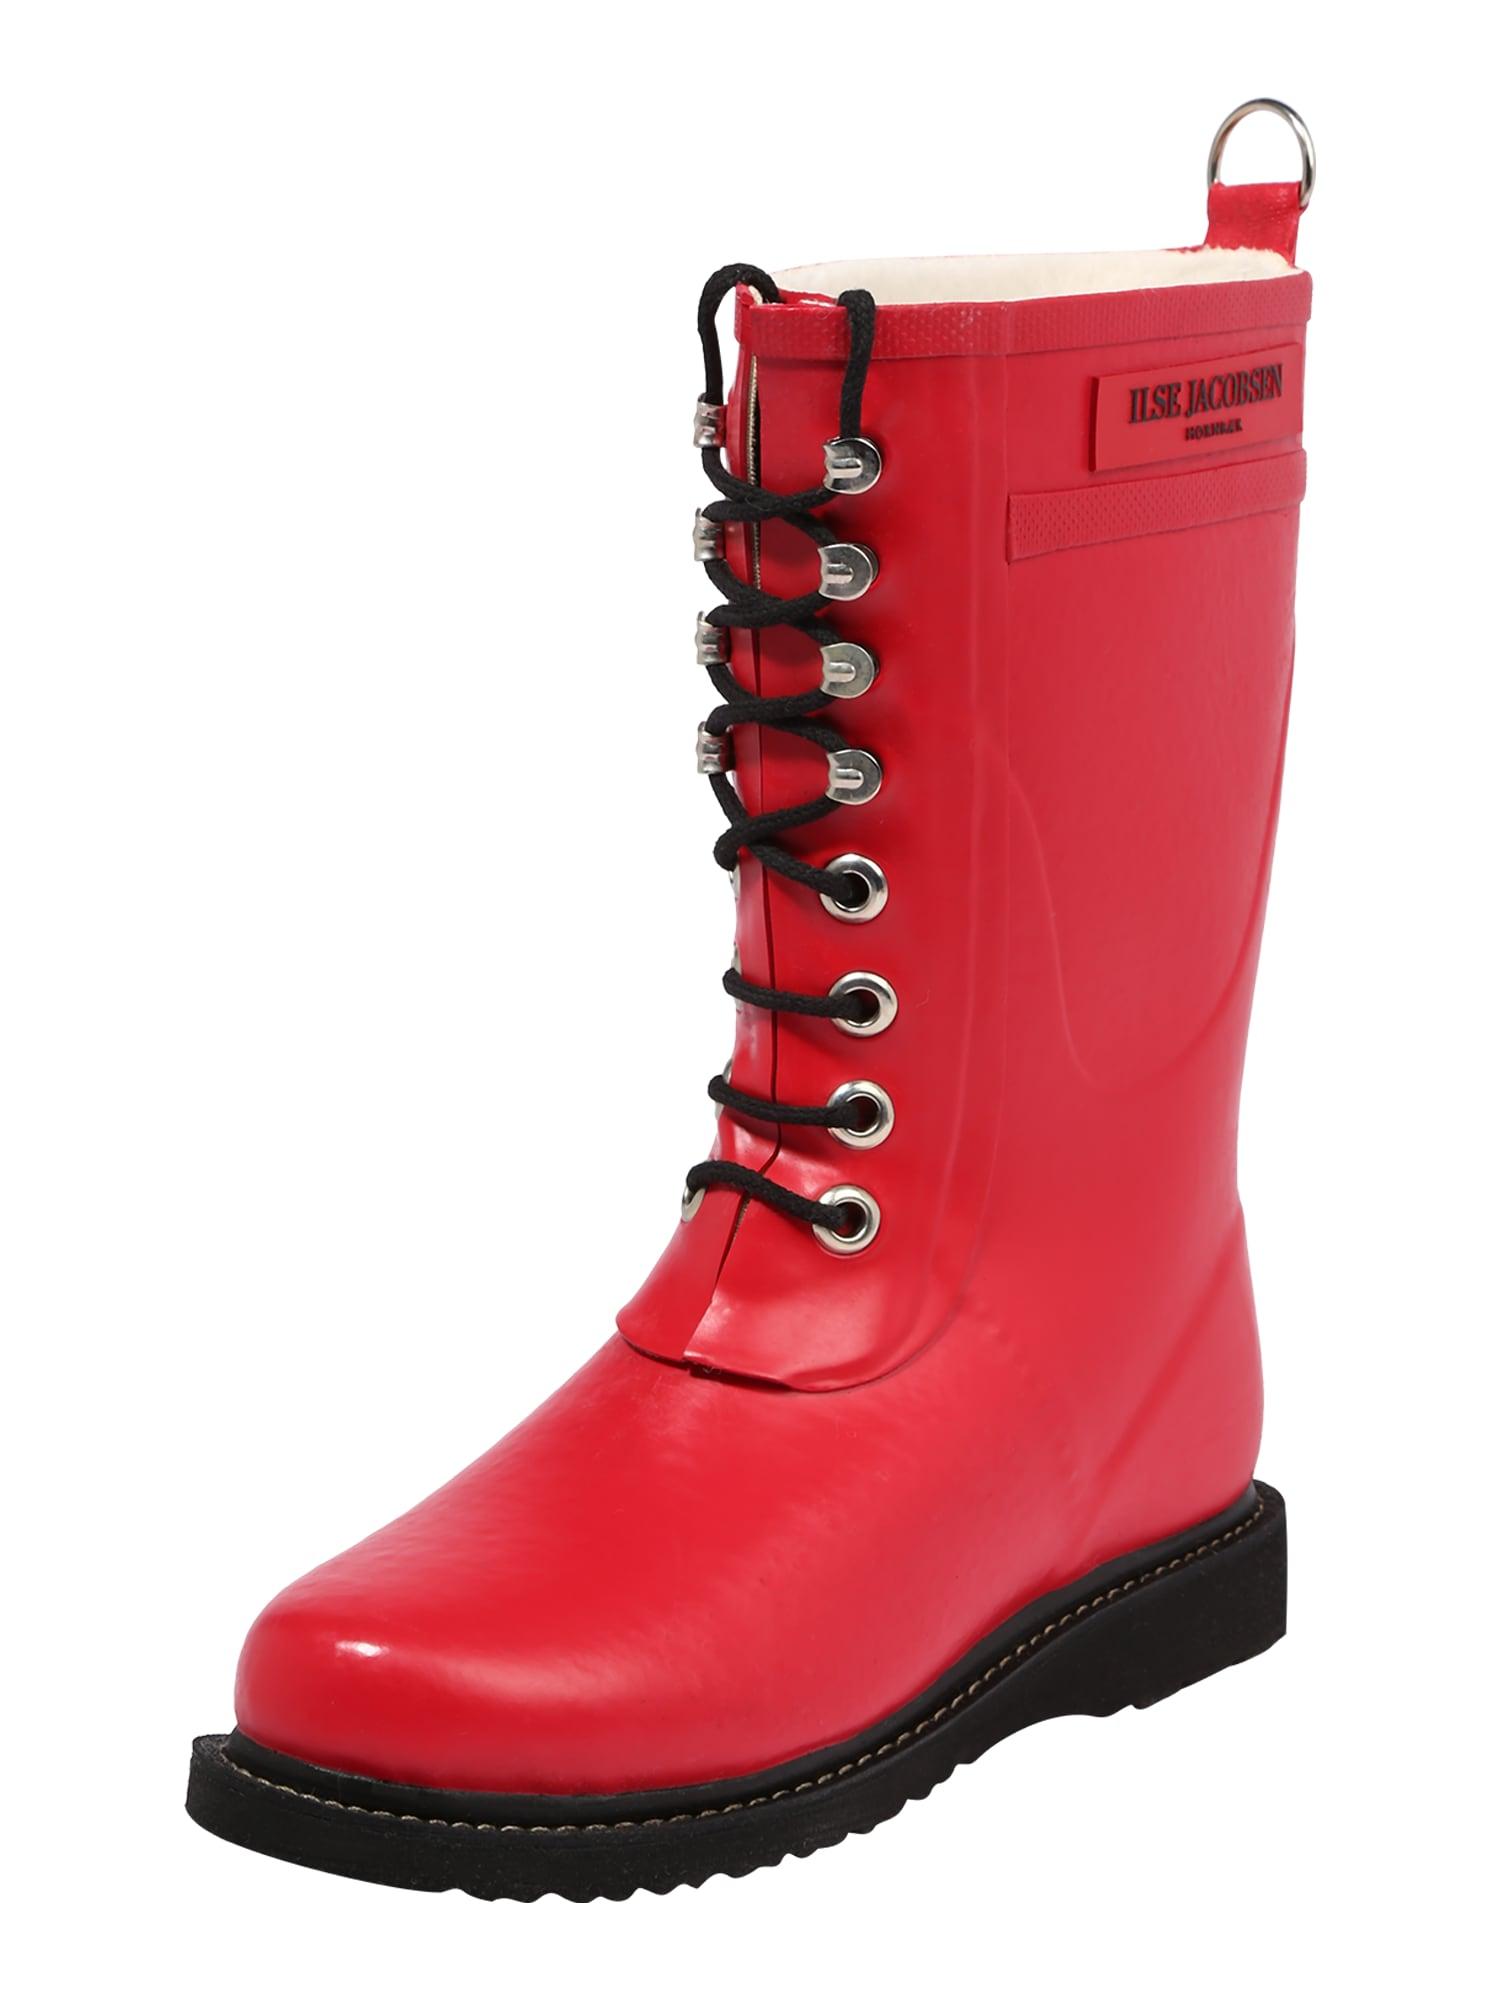 ILSE JACOBSEN Guminiai batai tamsiai raudona